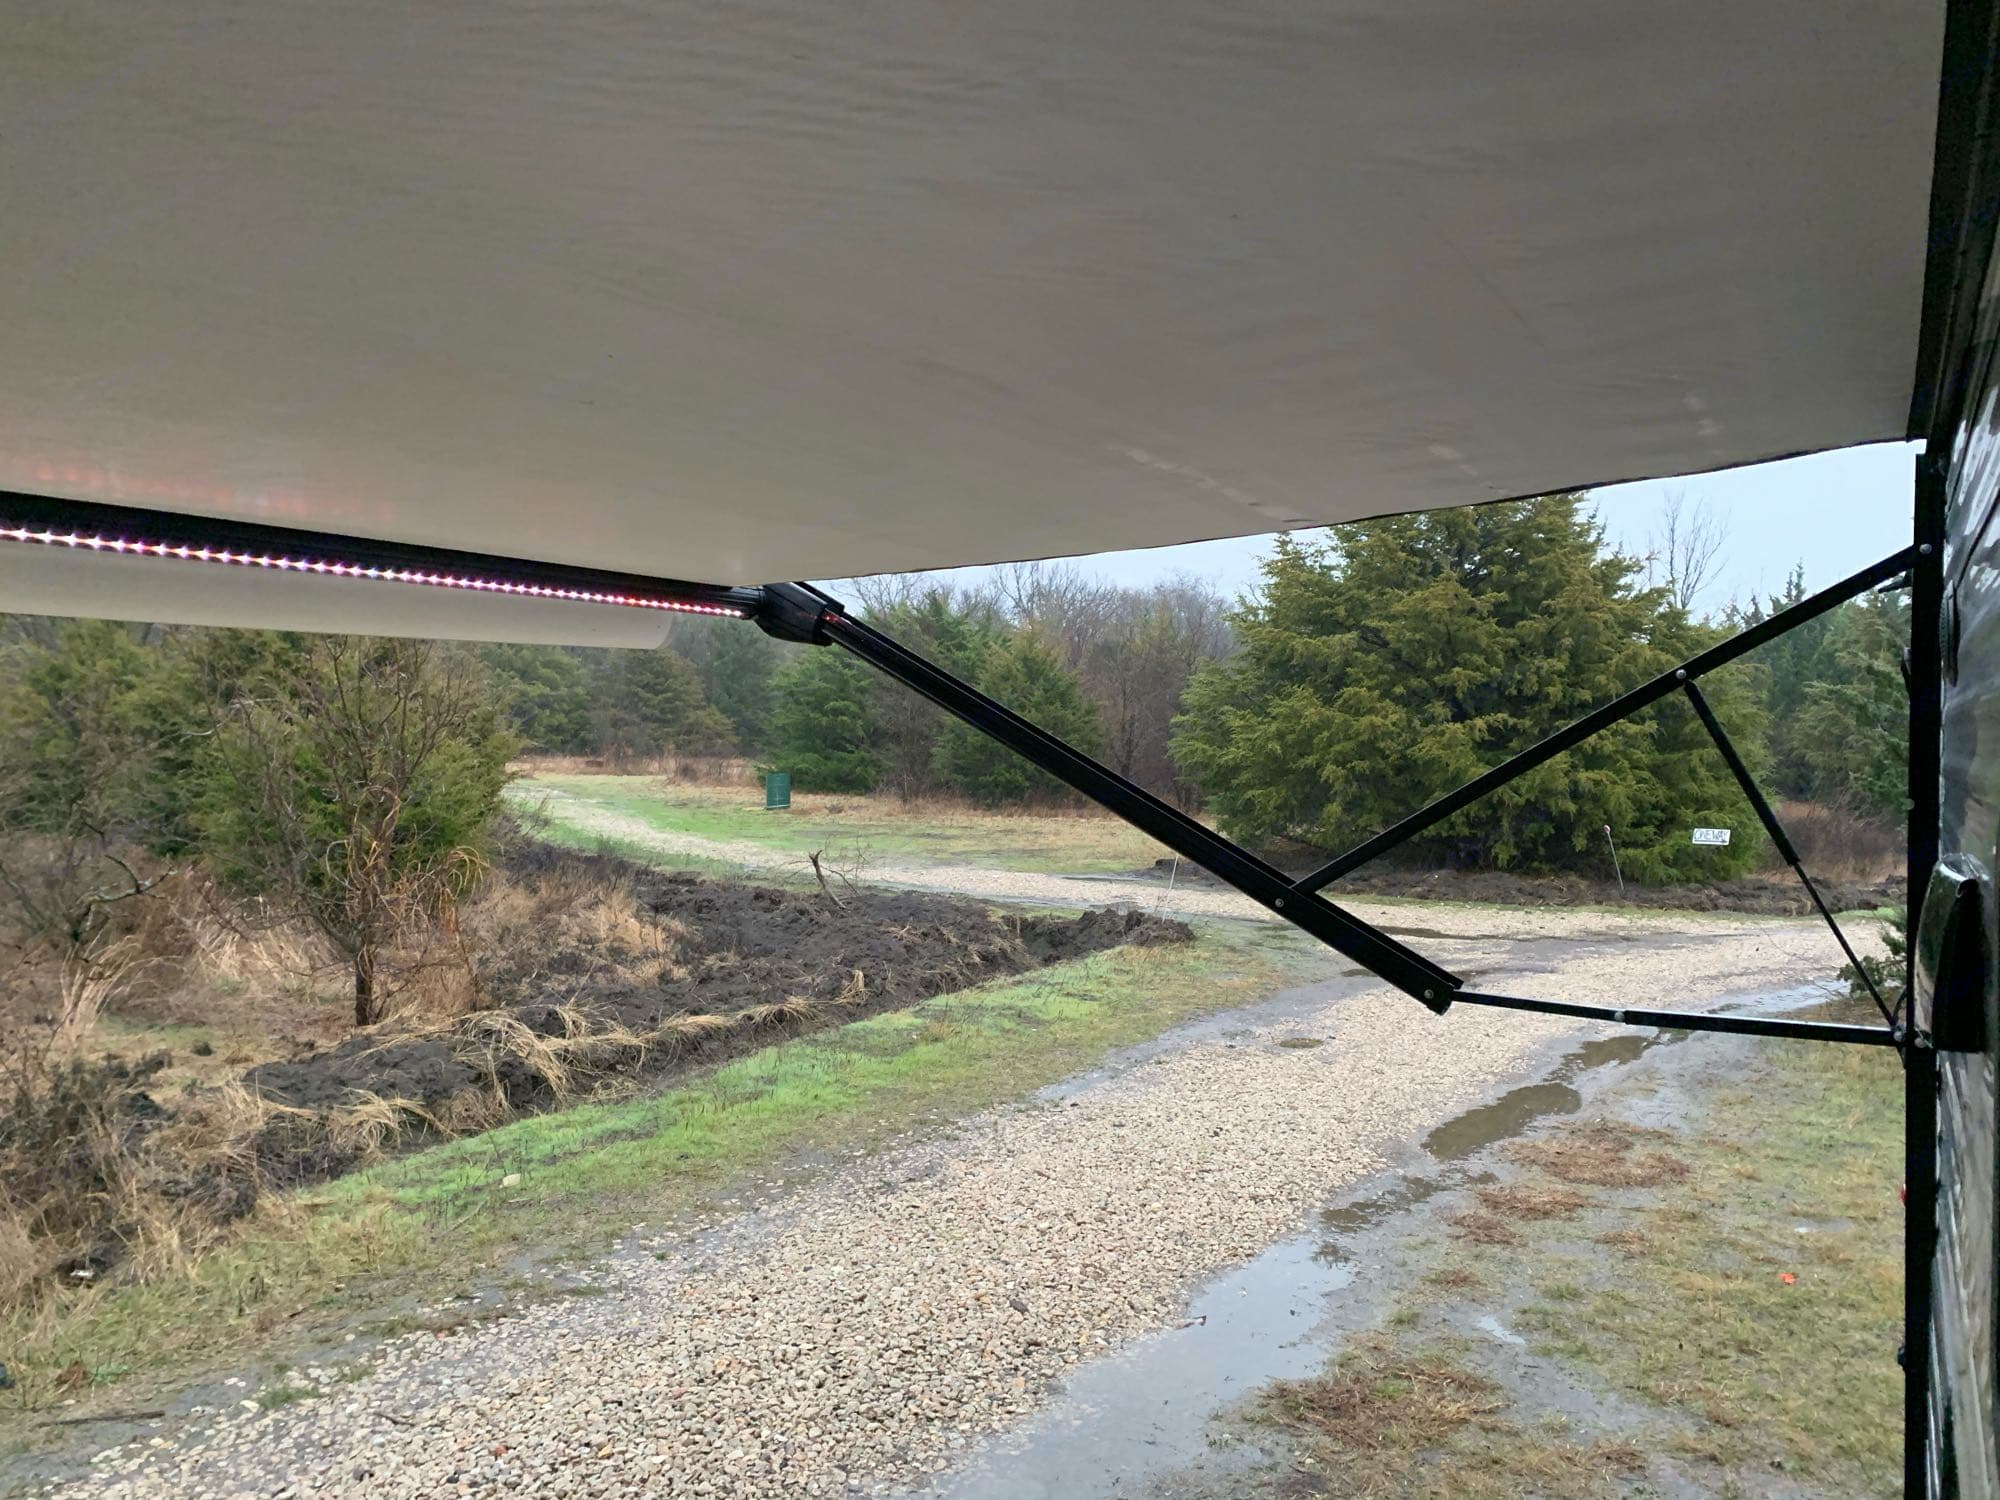 Adjustable awning with led light bar. Heartland Pioneer 2018